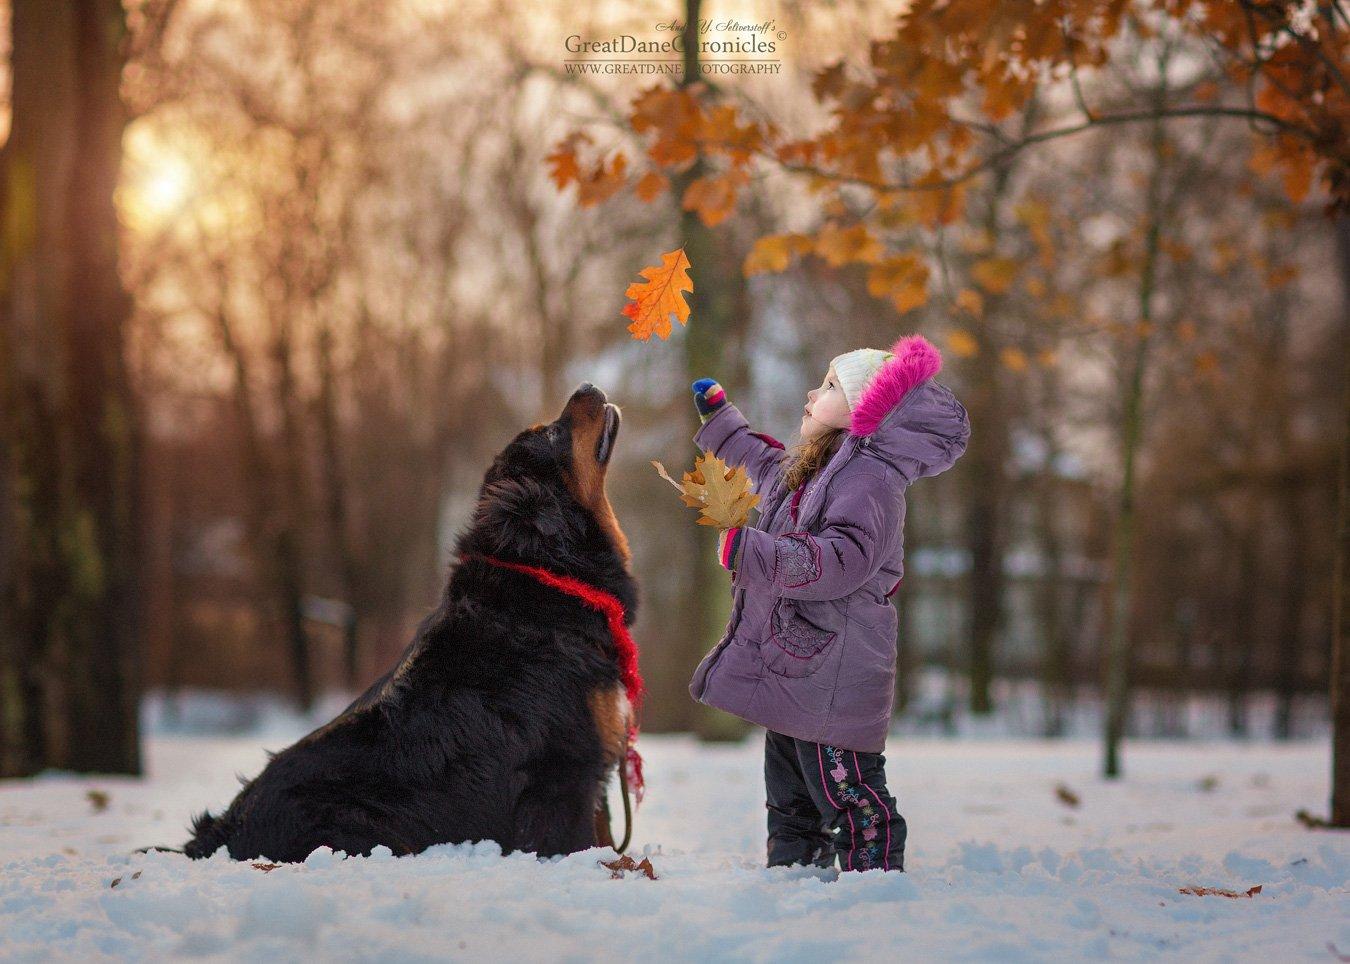 тибетский мастифф, собаки, зима, дети, Андрей Селиверстов